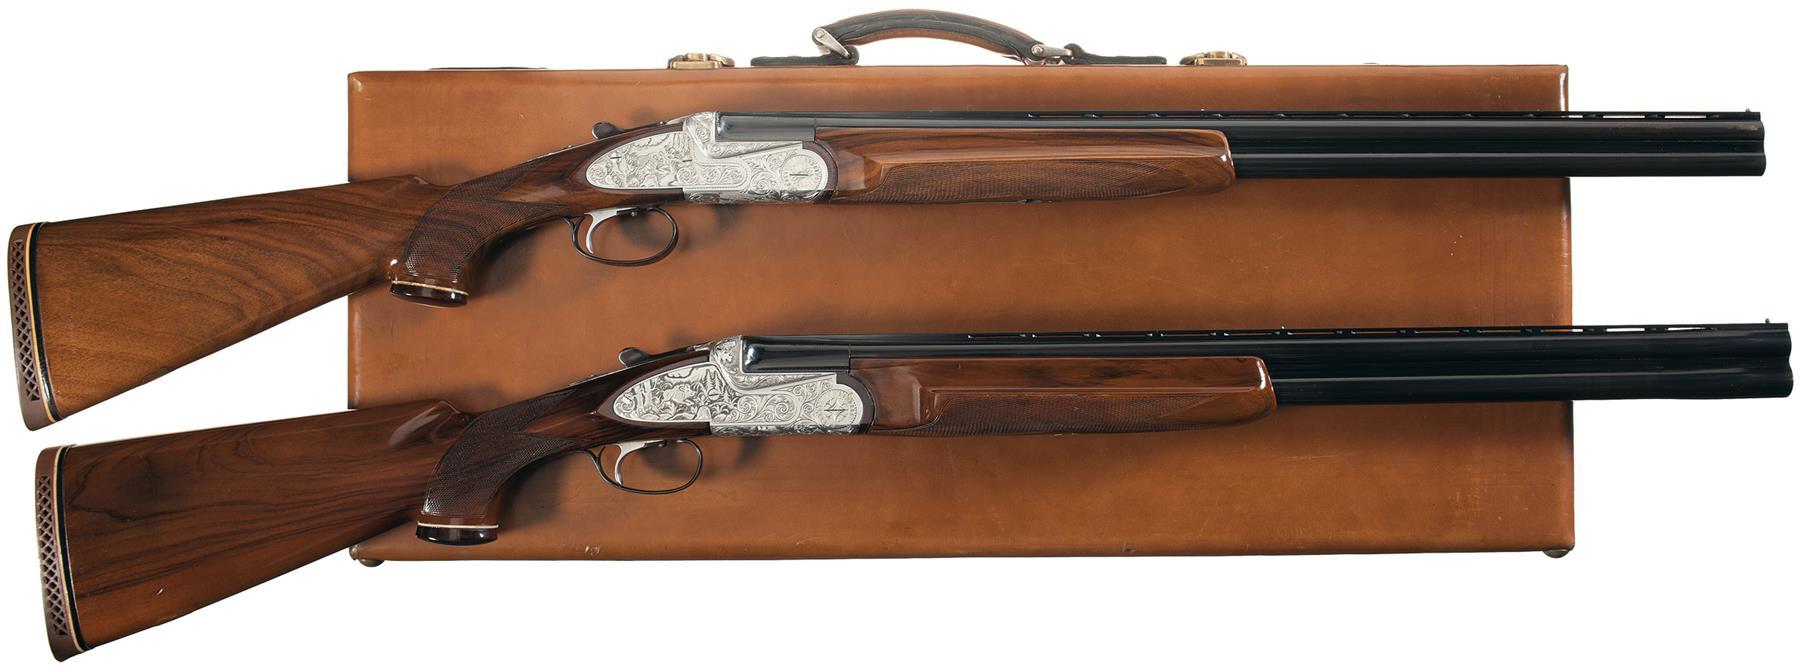 Italian - Double Barrel-Shotgun Firearms Auction Lot-378